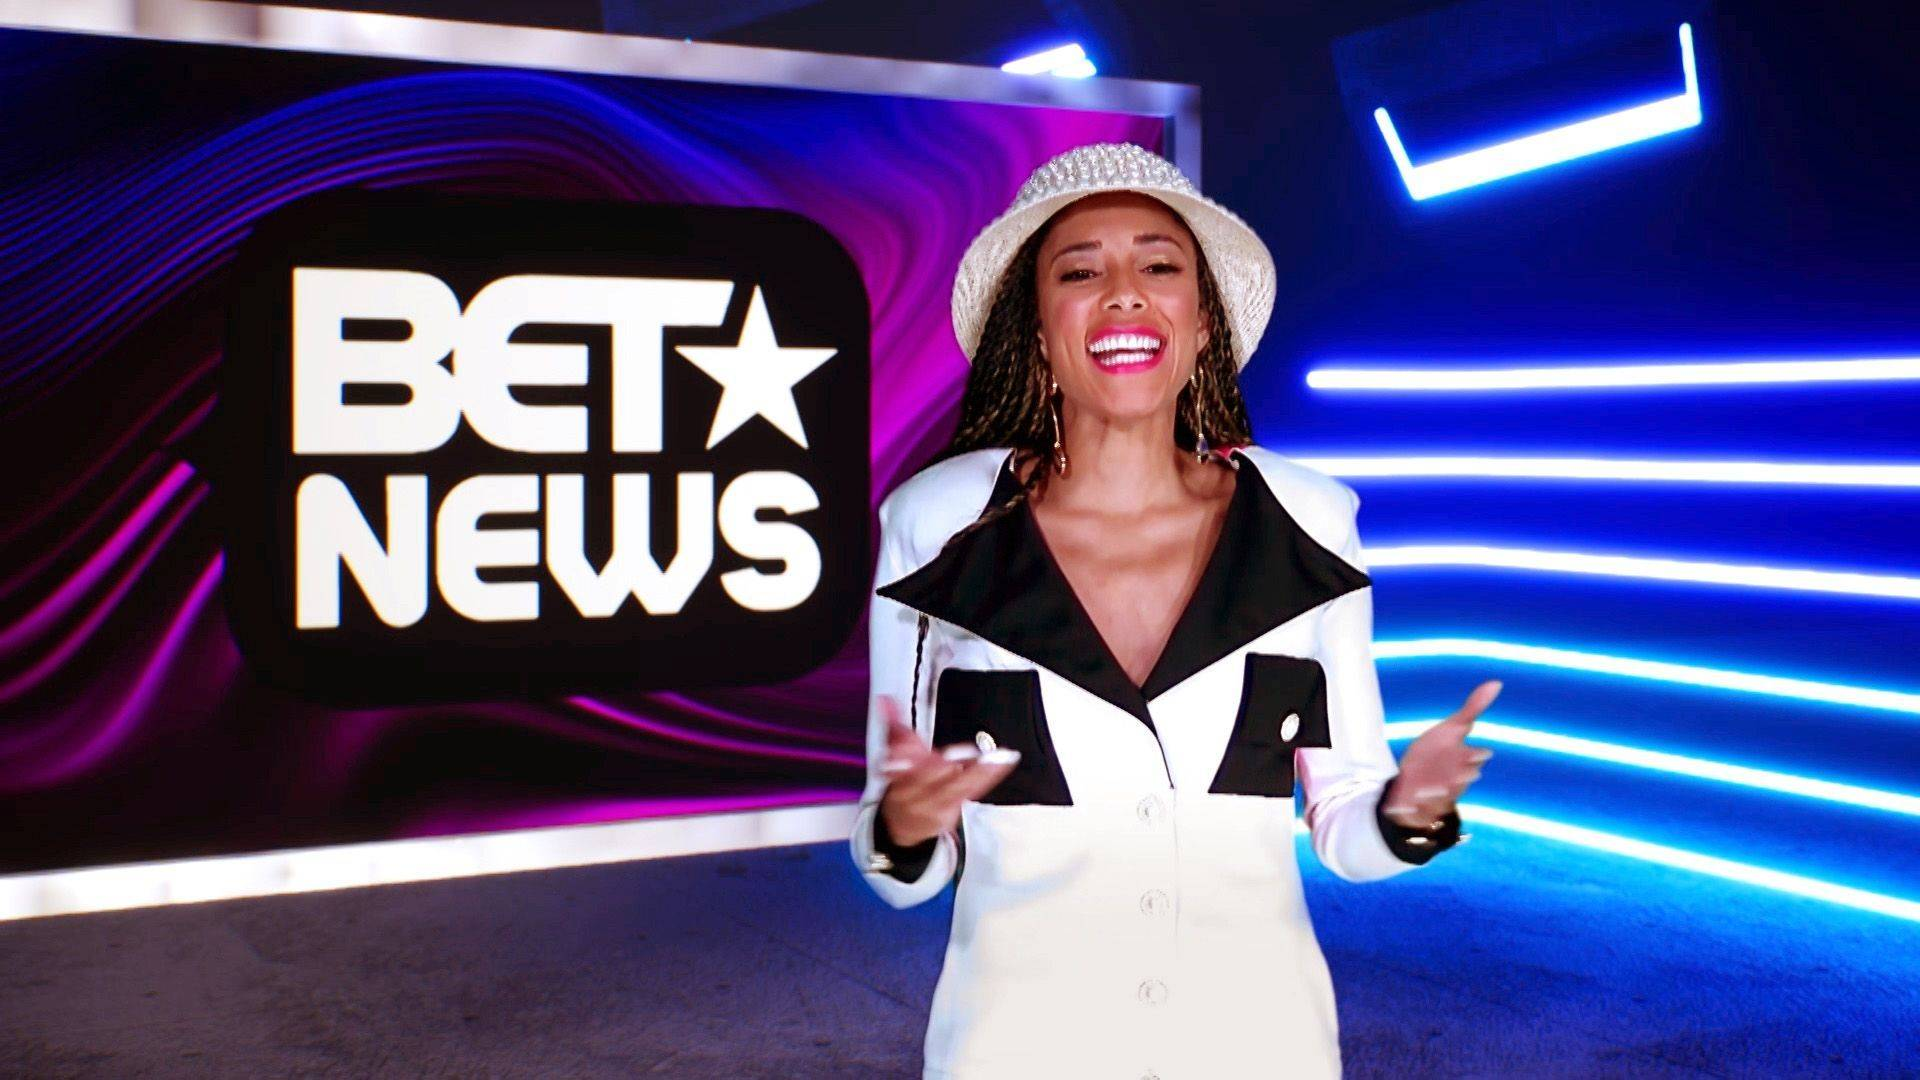 BET Awards 2020 | Host Looks Gallery 1 | 1920x1080